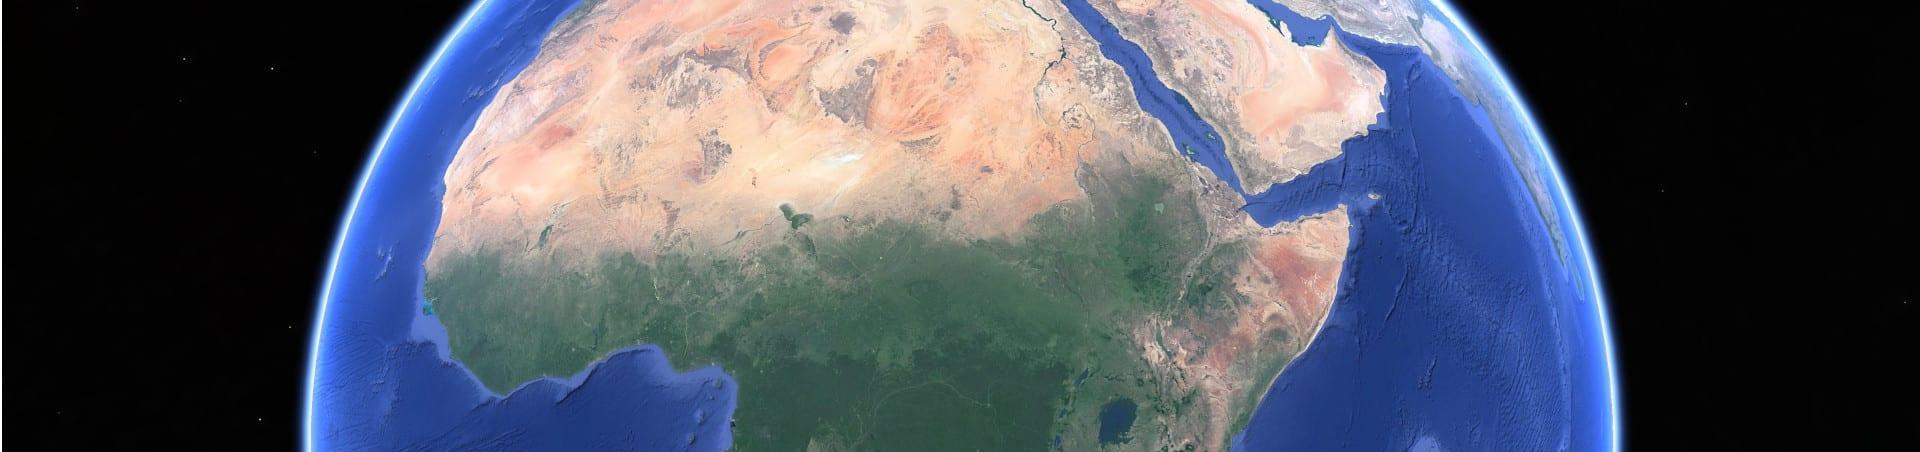 Afrika aus dem All